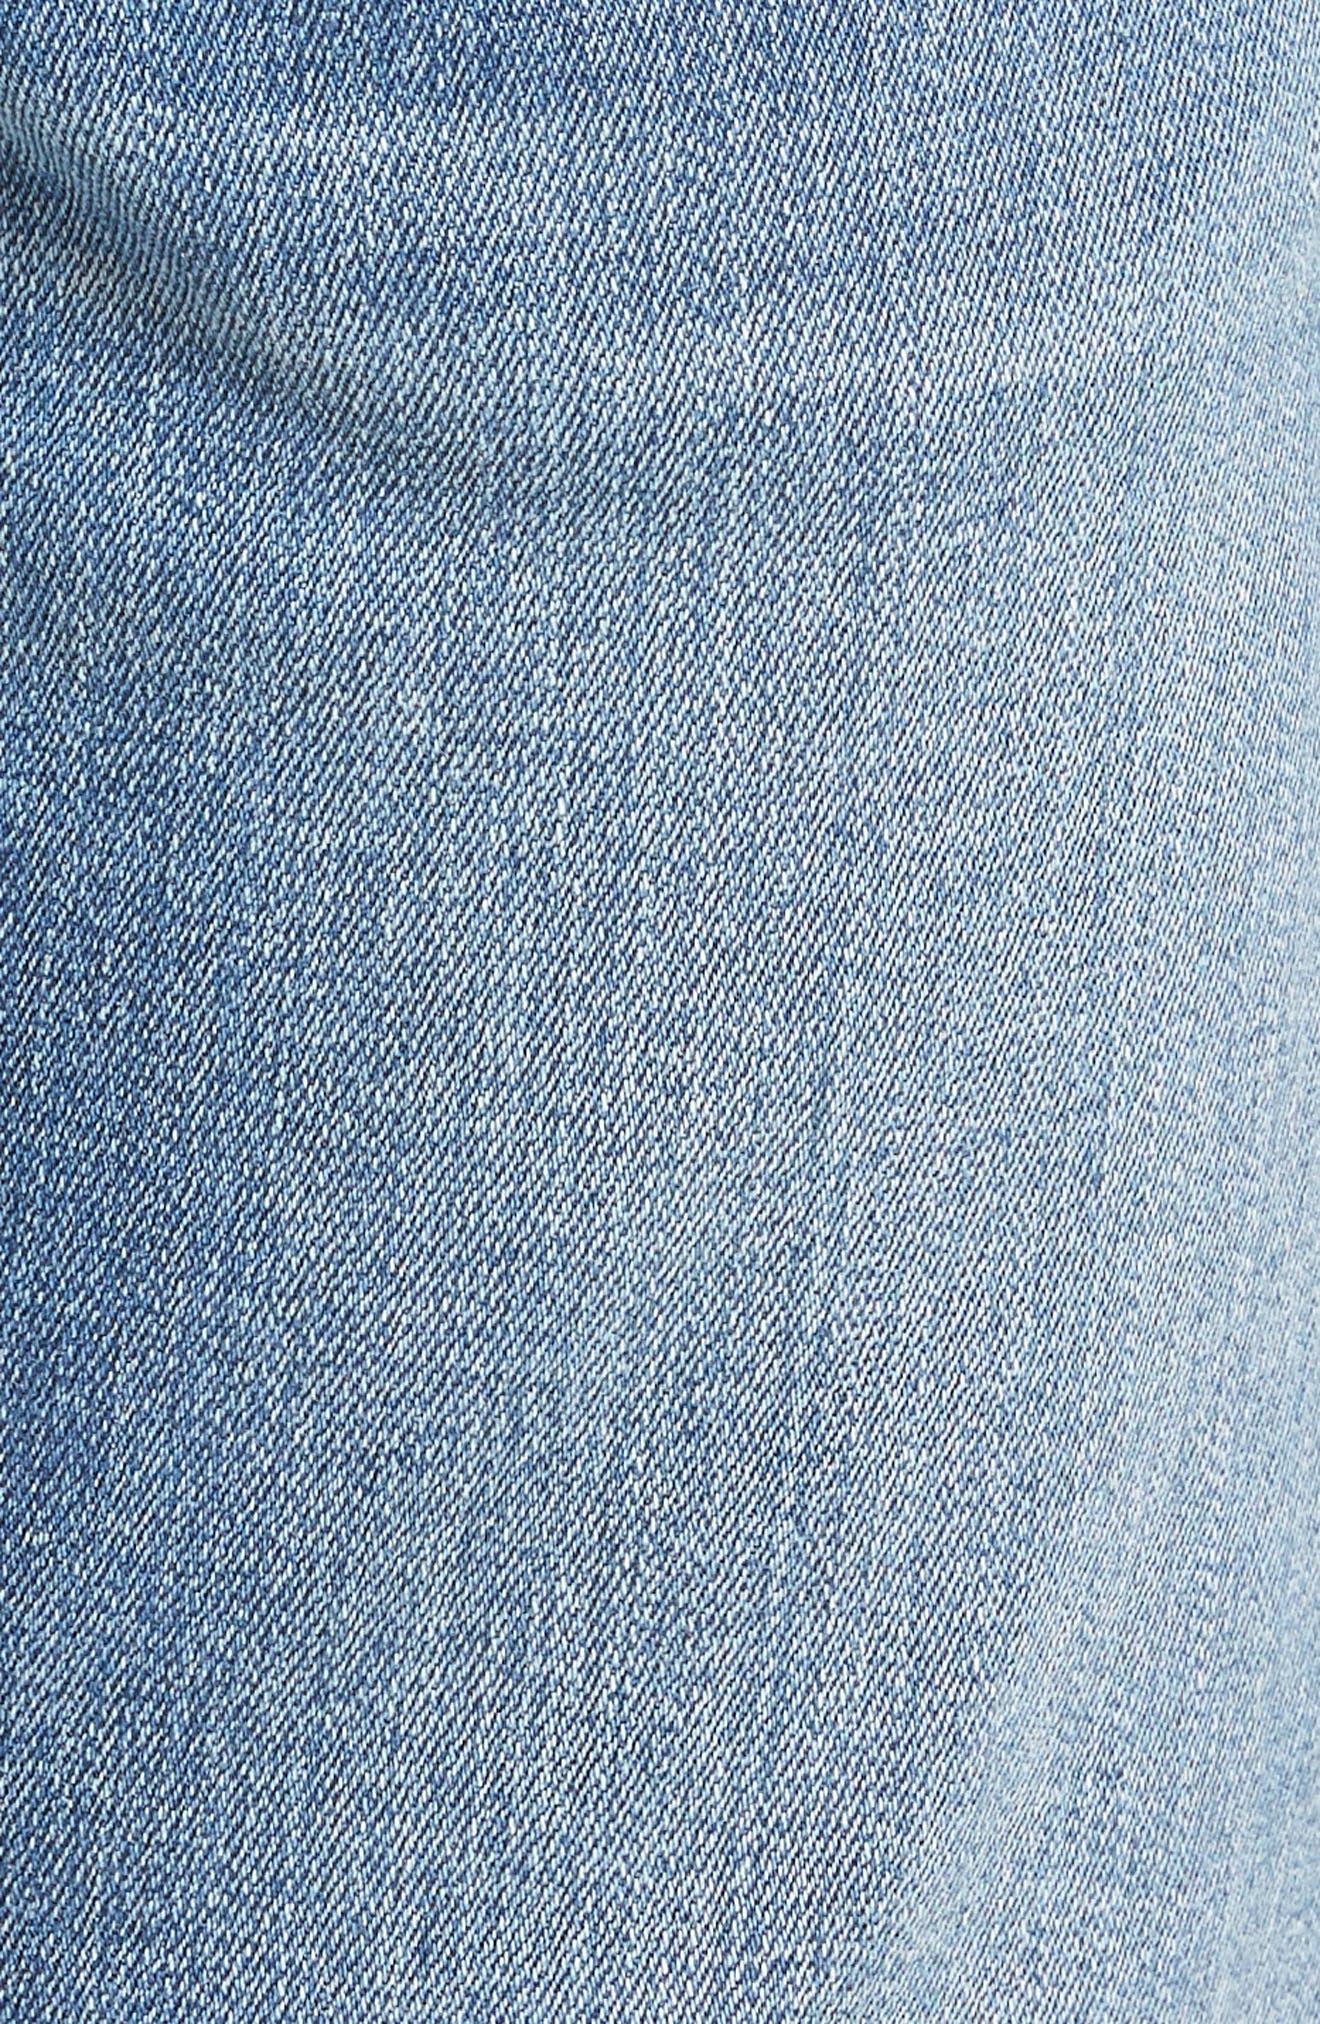 Jake Slim Fit Jeans,                             Alternate thumbnail 5, color,                             Light Blue Willamsburg